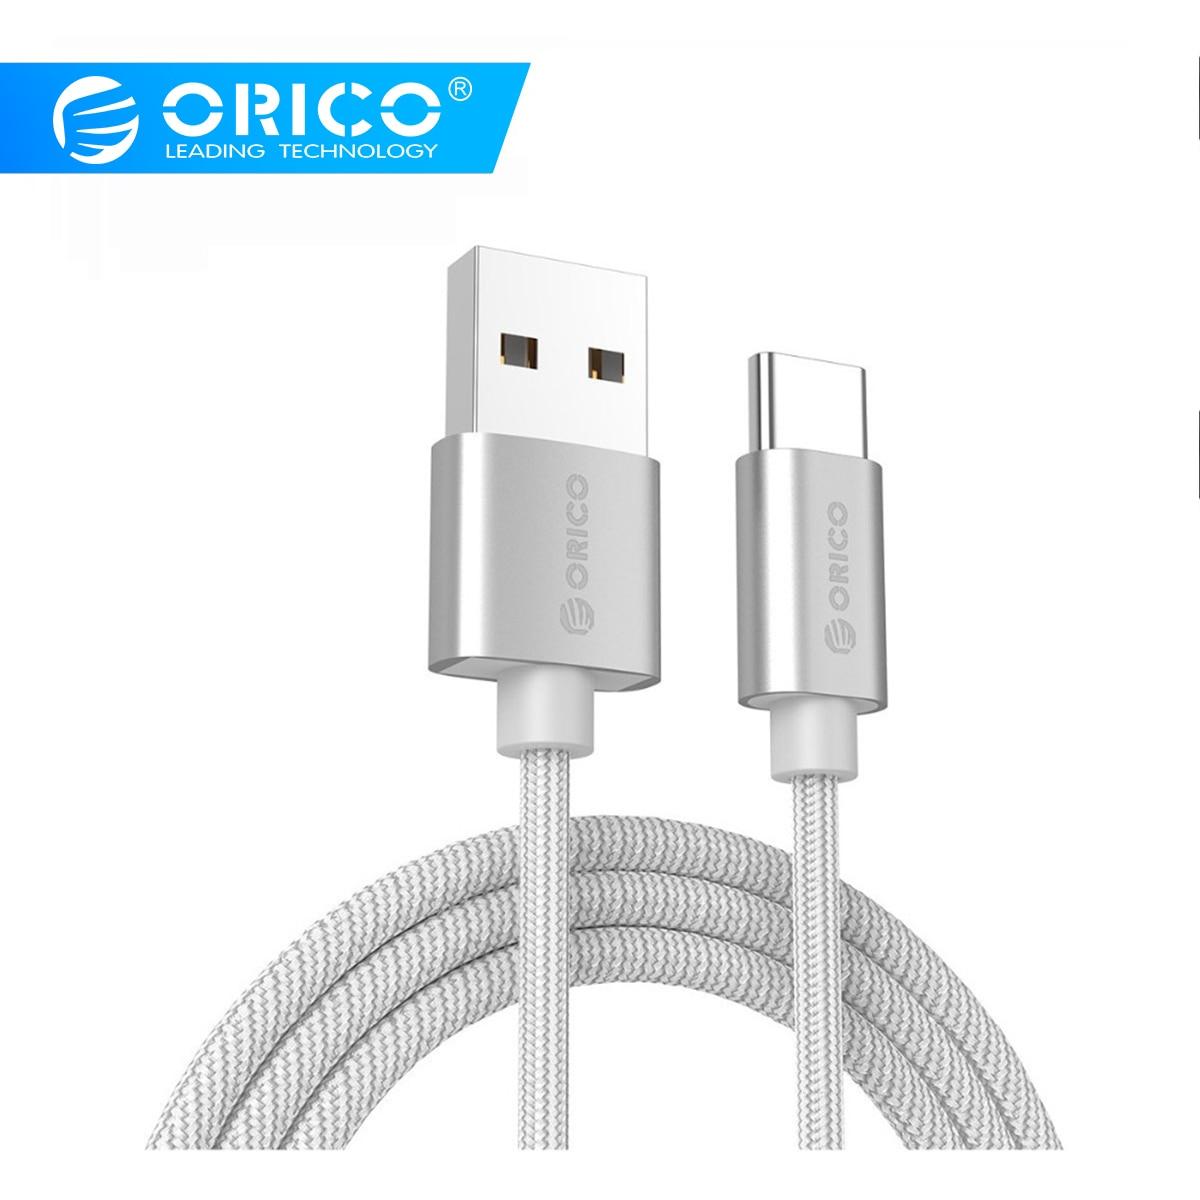 ORICO Nylon USB Type C Cable usb type c cables for xiaomi mi5 Oneplus LG Nexus 5x huawei samsung letv usb type c wire|cable for|usb type-c cable|type-c cable - AliExpress